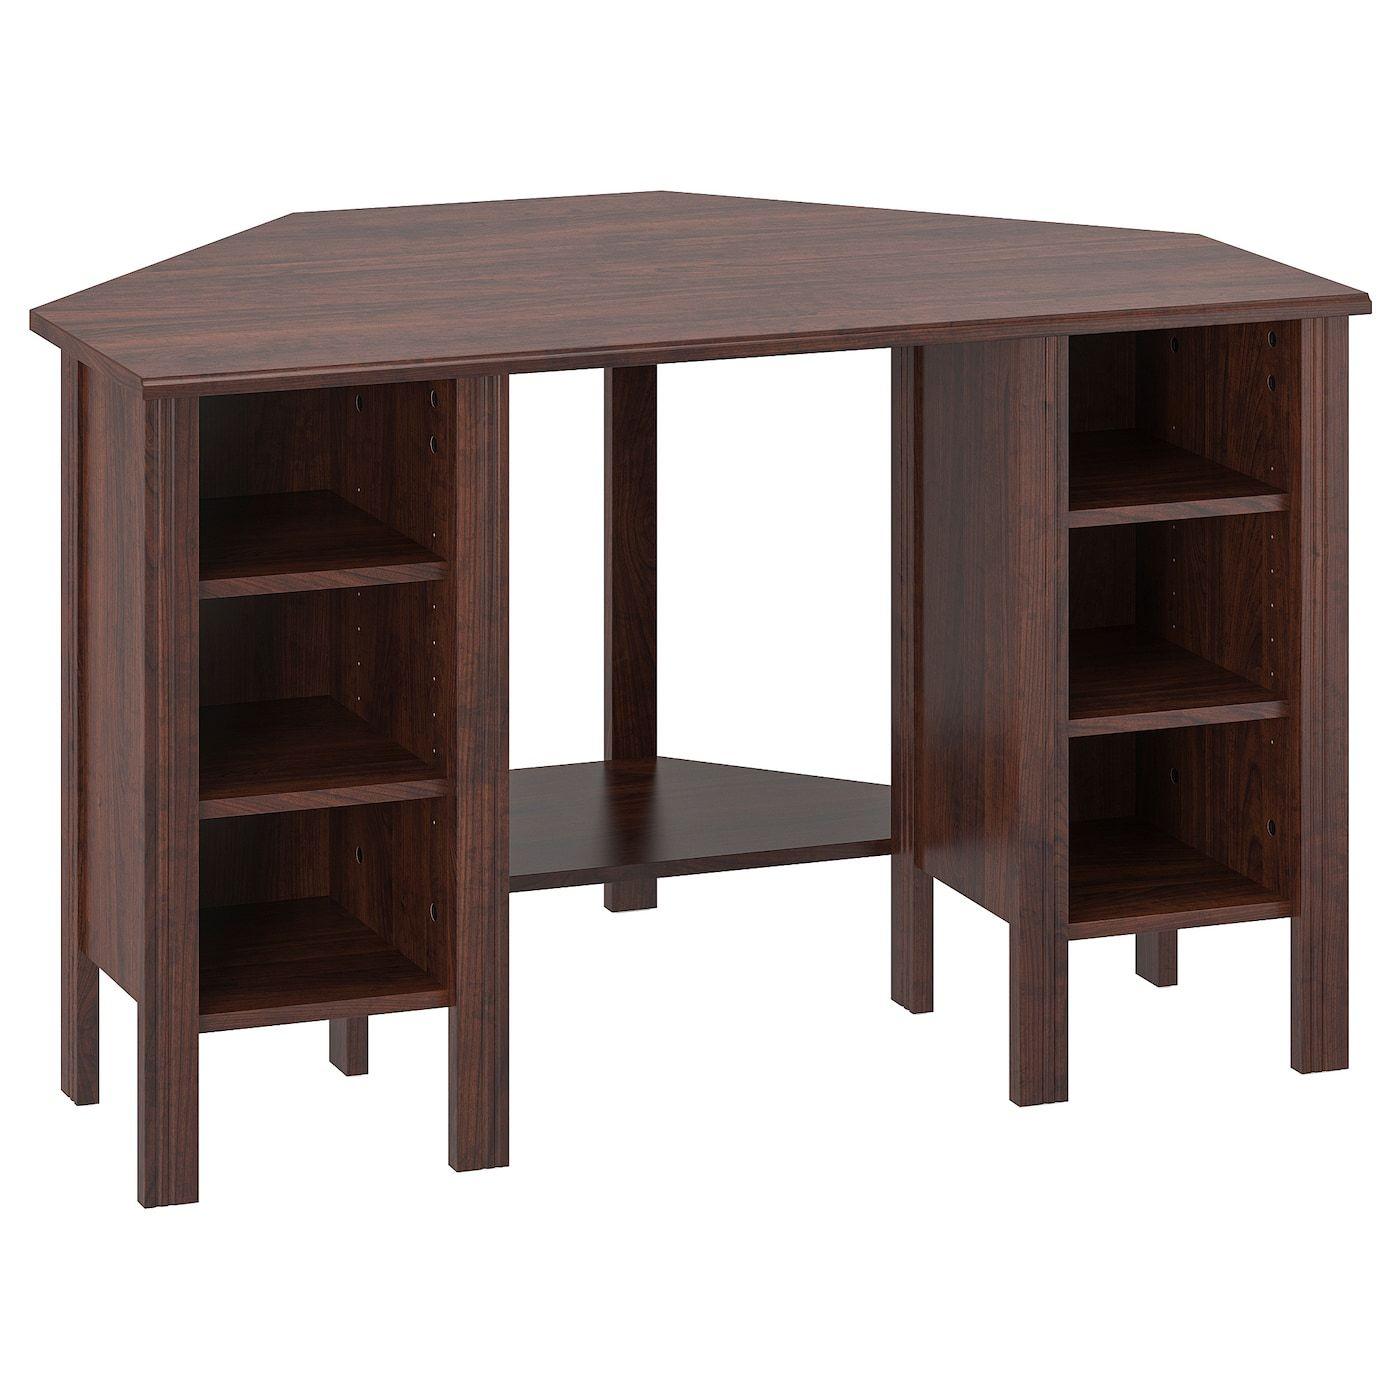 Brusali Corner Desk Brown 47 1 4x28 3 4 Ikea Brusali Ikea